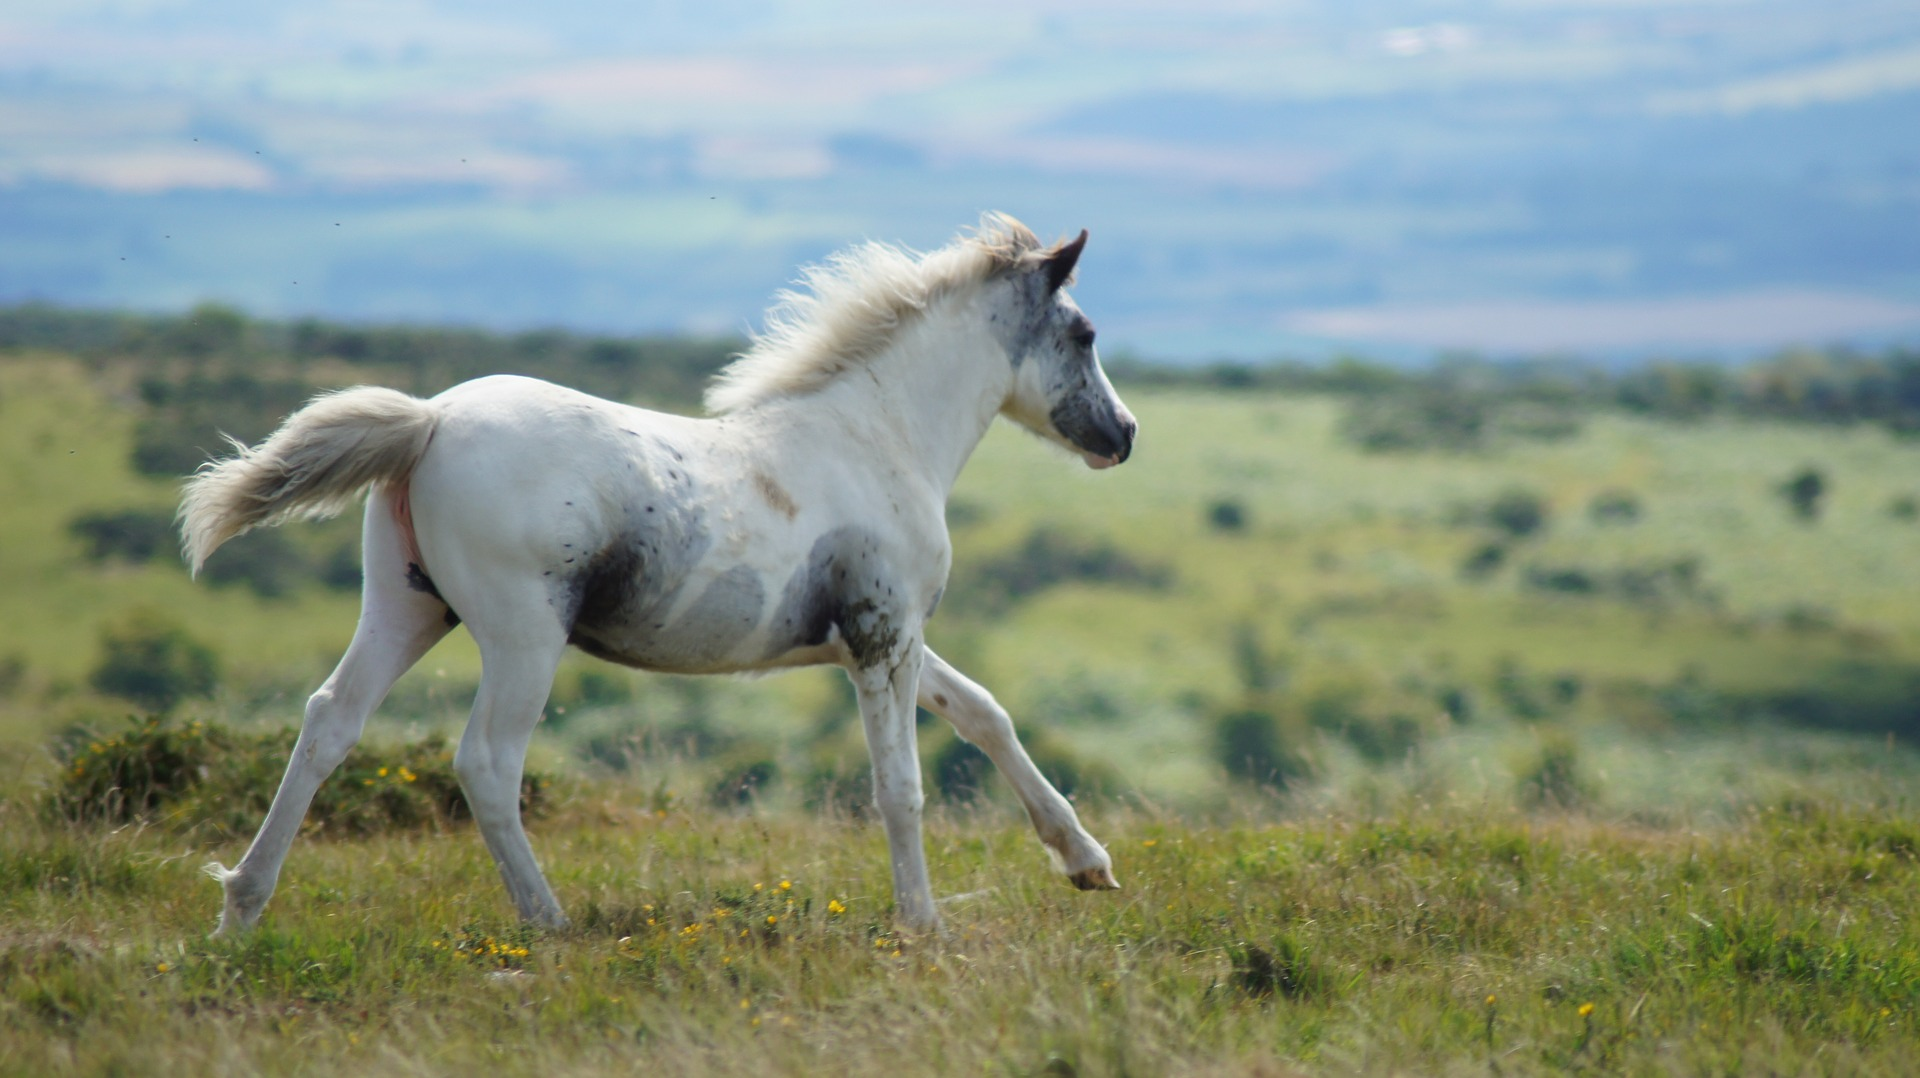 Wild Horses Wallpaper Posted By Sarah Mercado